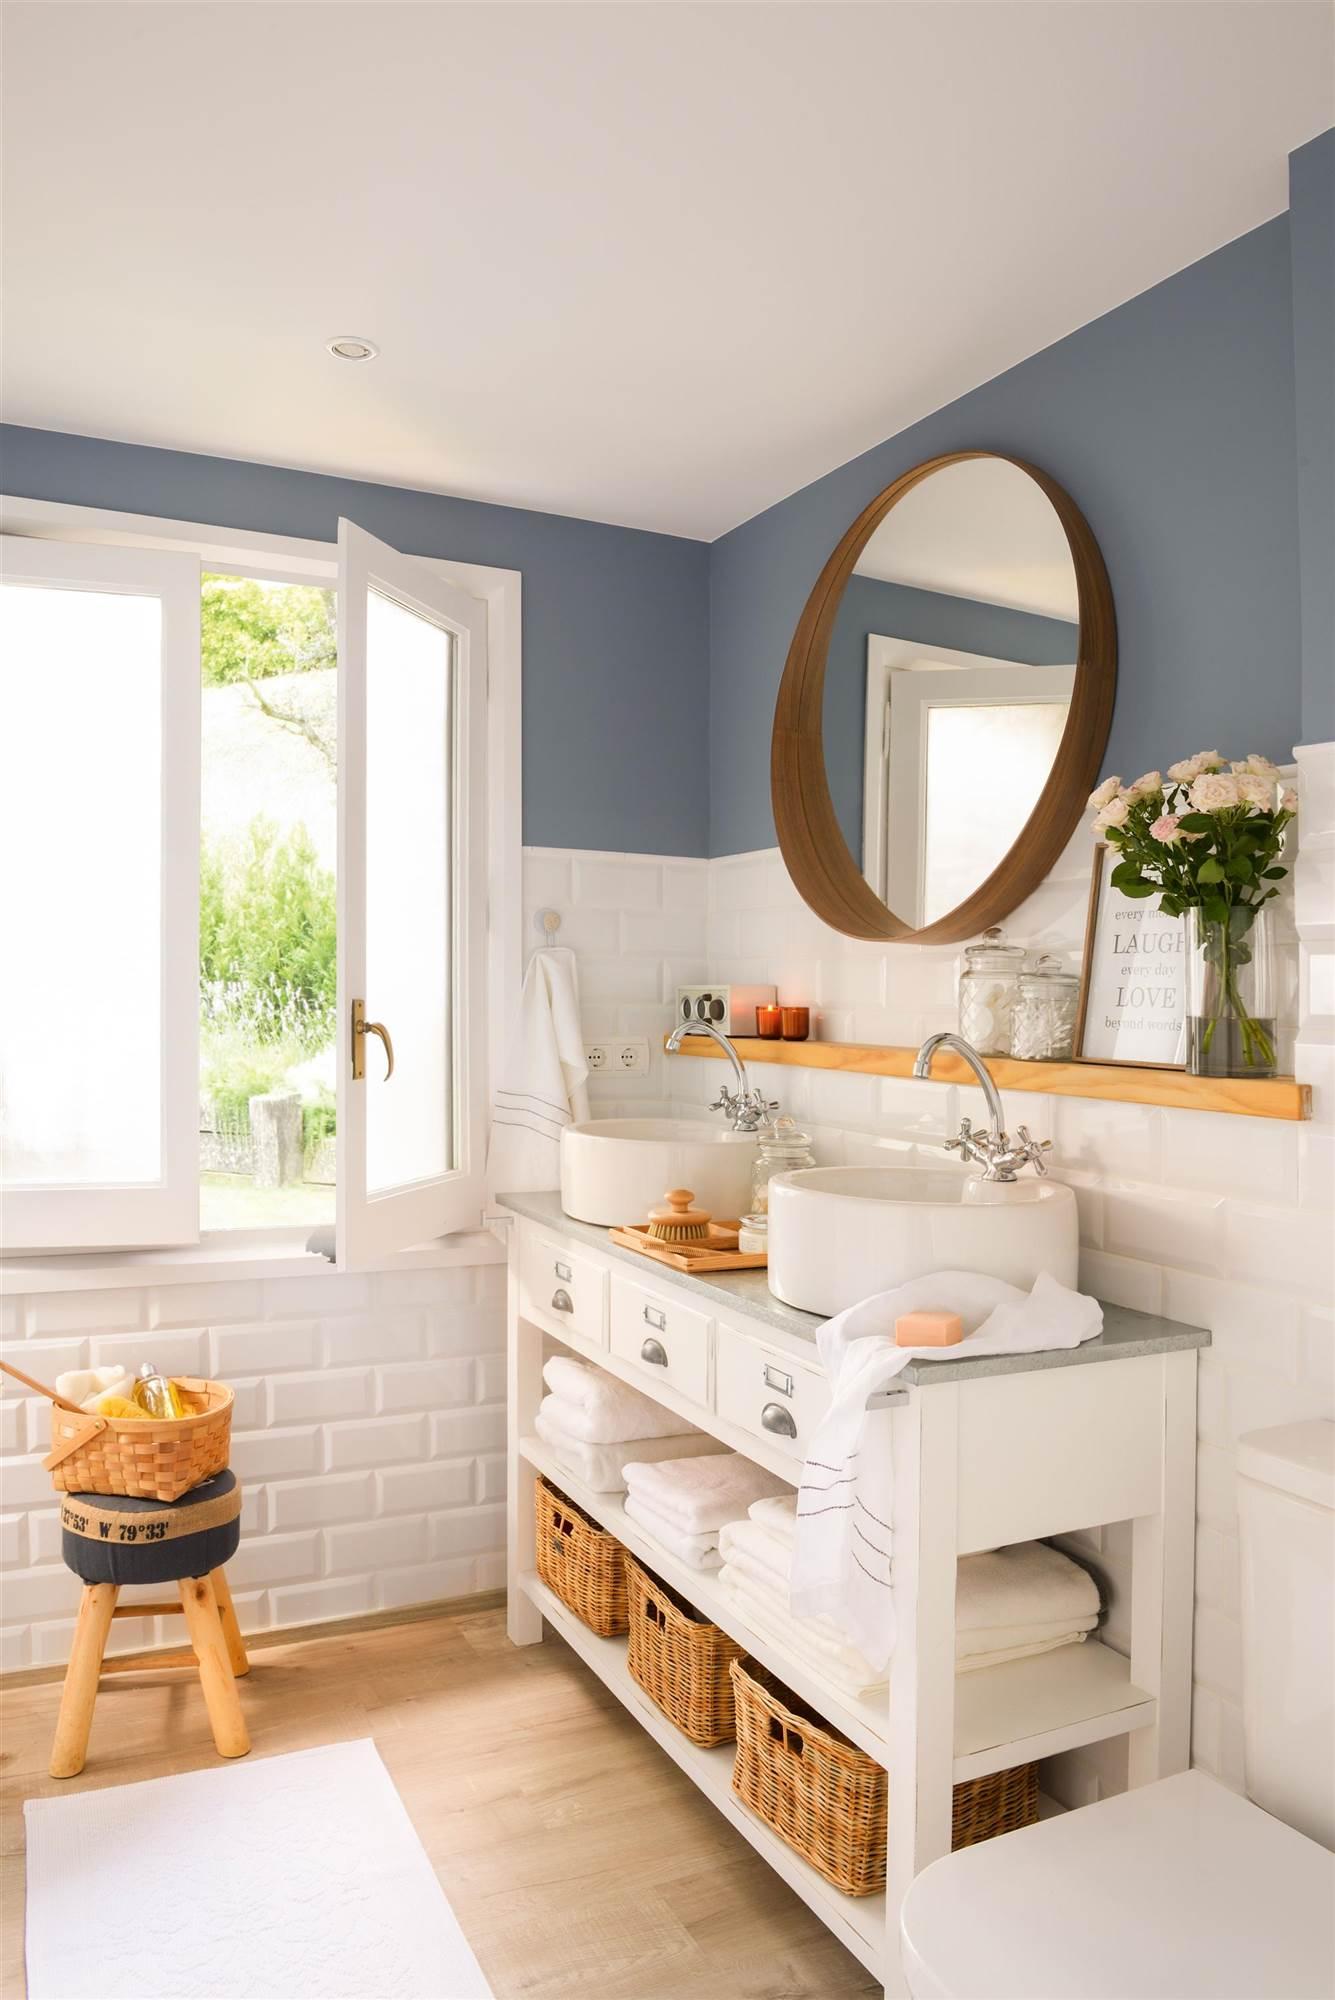 13 espacios decorados con baldosas tipo metro for Cocinas con azulejos beige